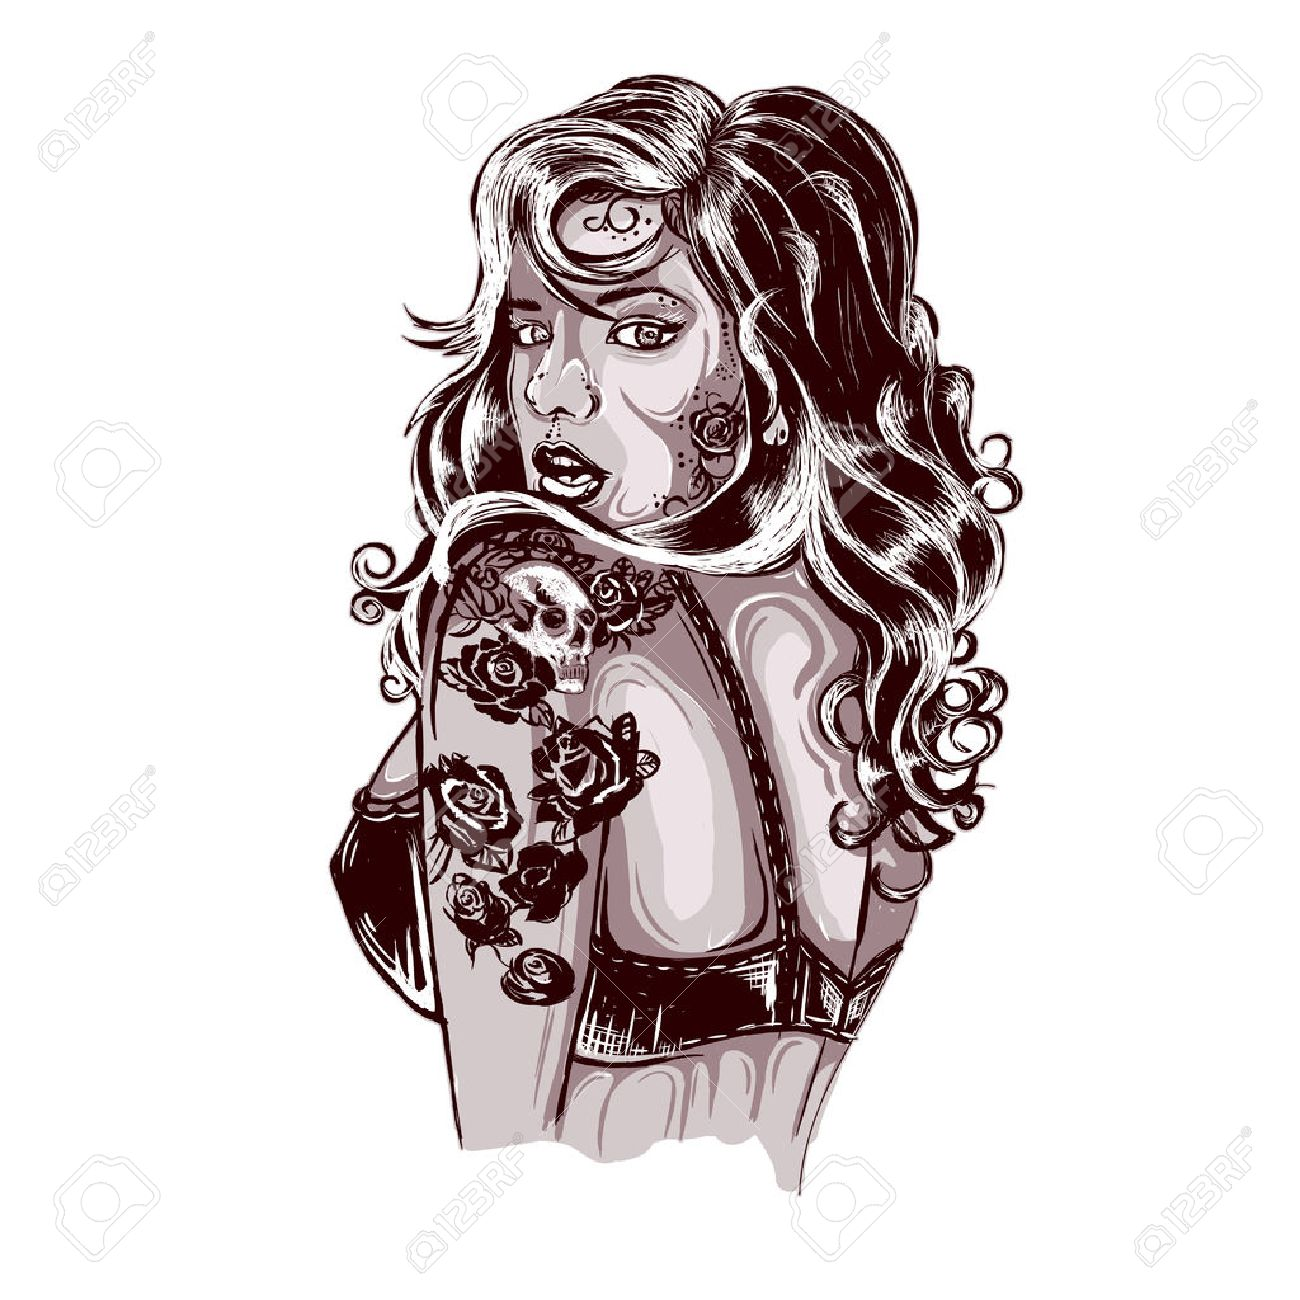 Diseño Tatuajes Old School Swallow Tattoo Shop Señora Tatuada Imagen